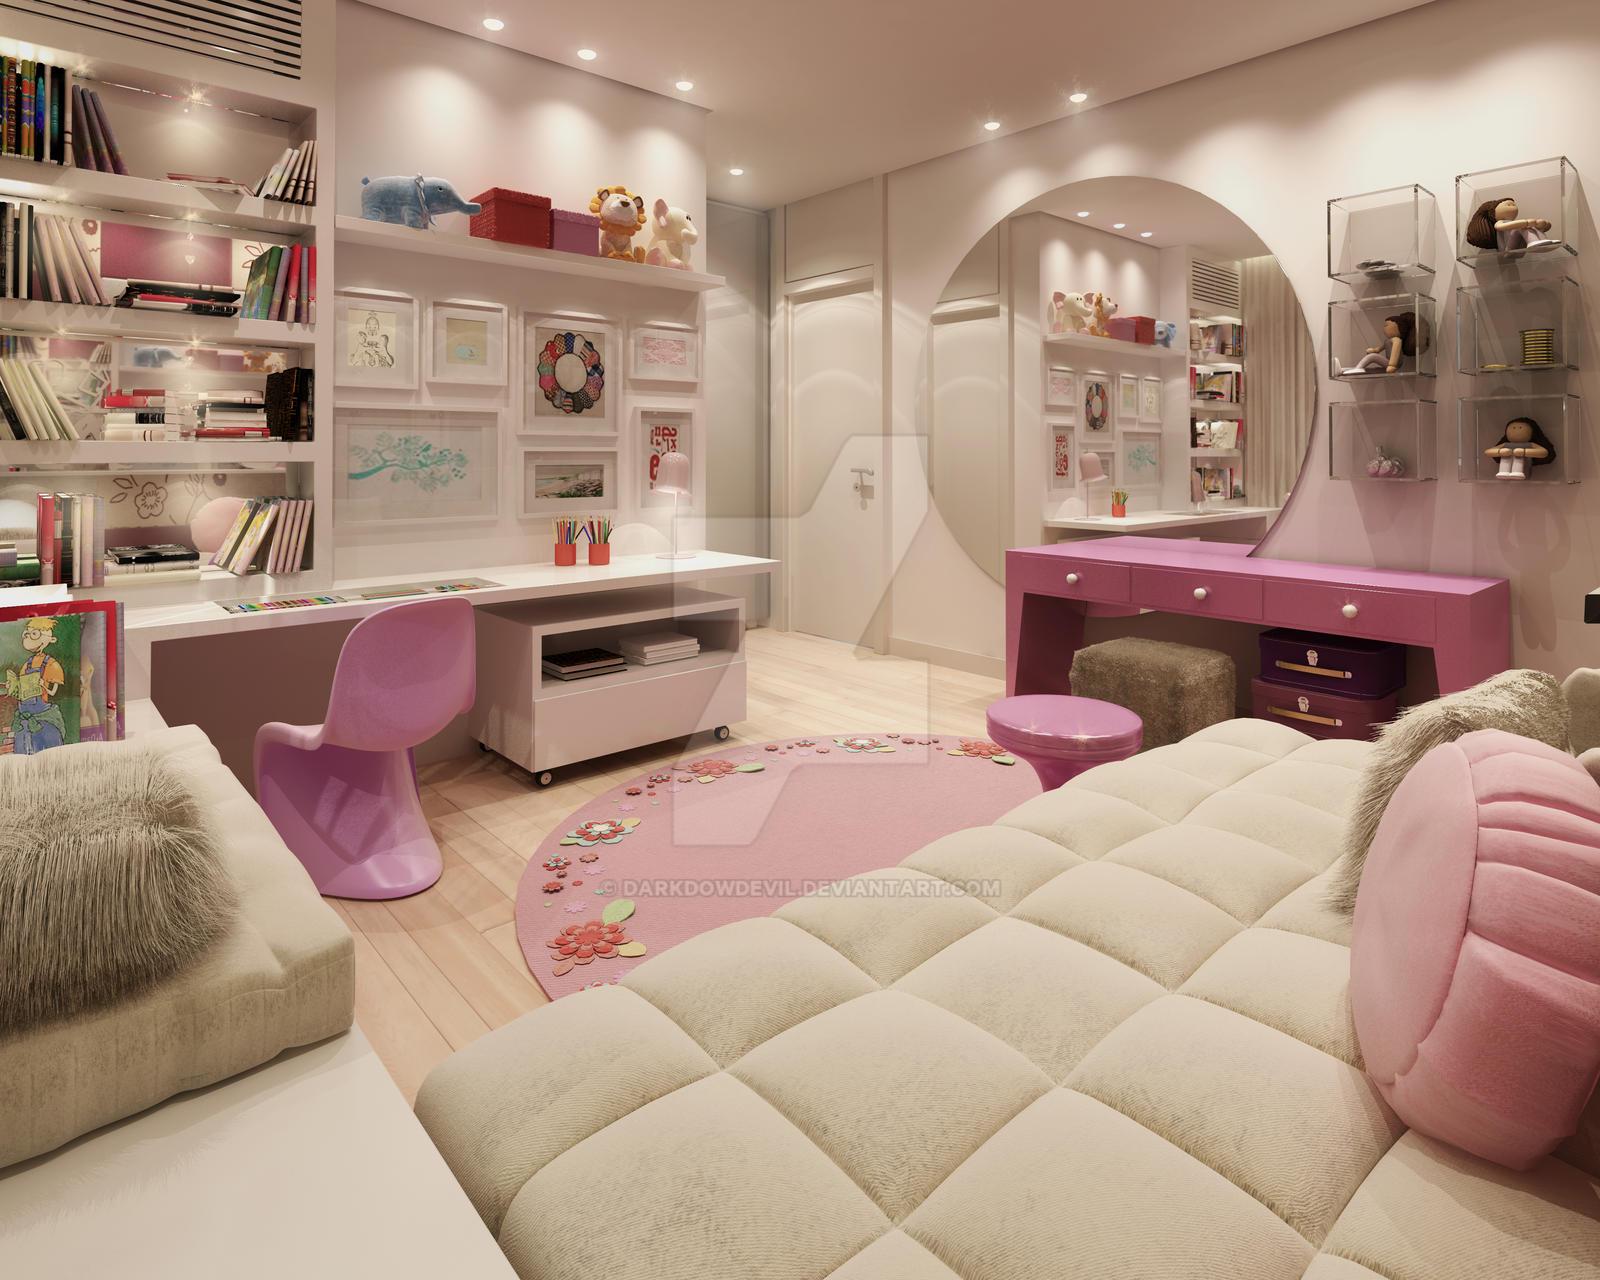 girl bedroom2 by DARKDOWDEVIL